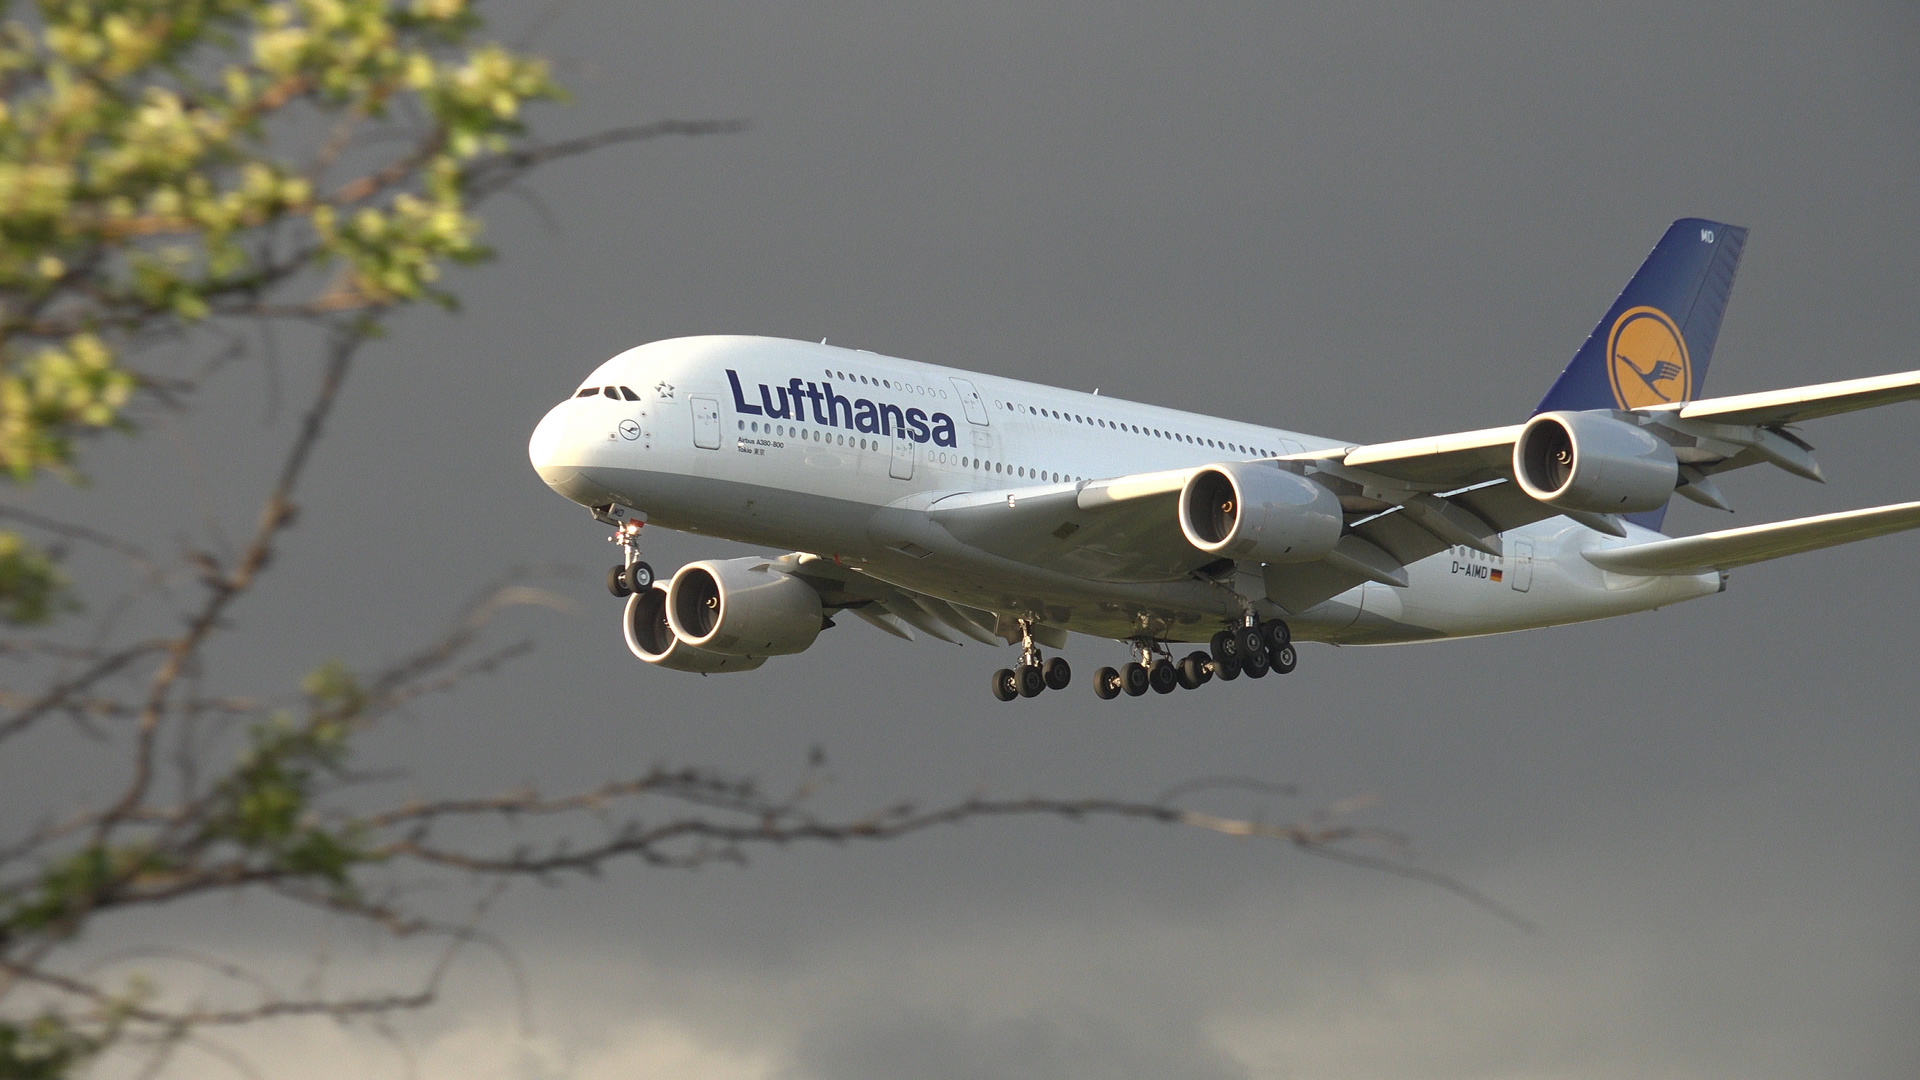 Lufthansa Jet A380-800 - Im Landeanflug auf Frankfurt.